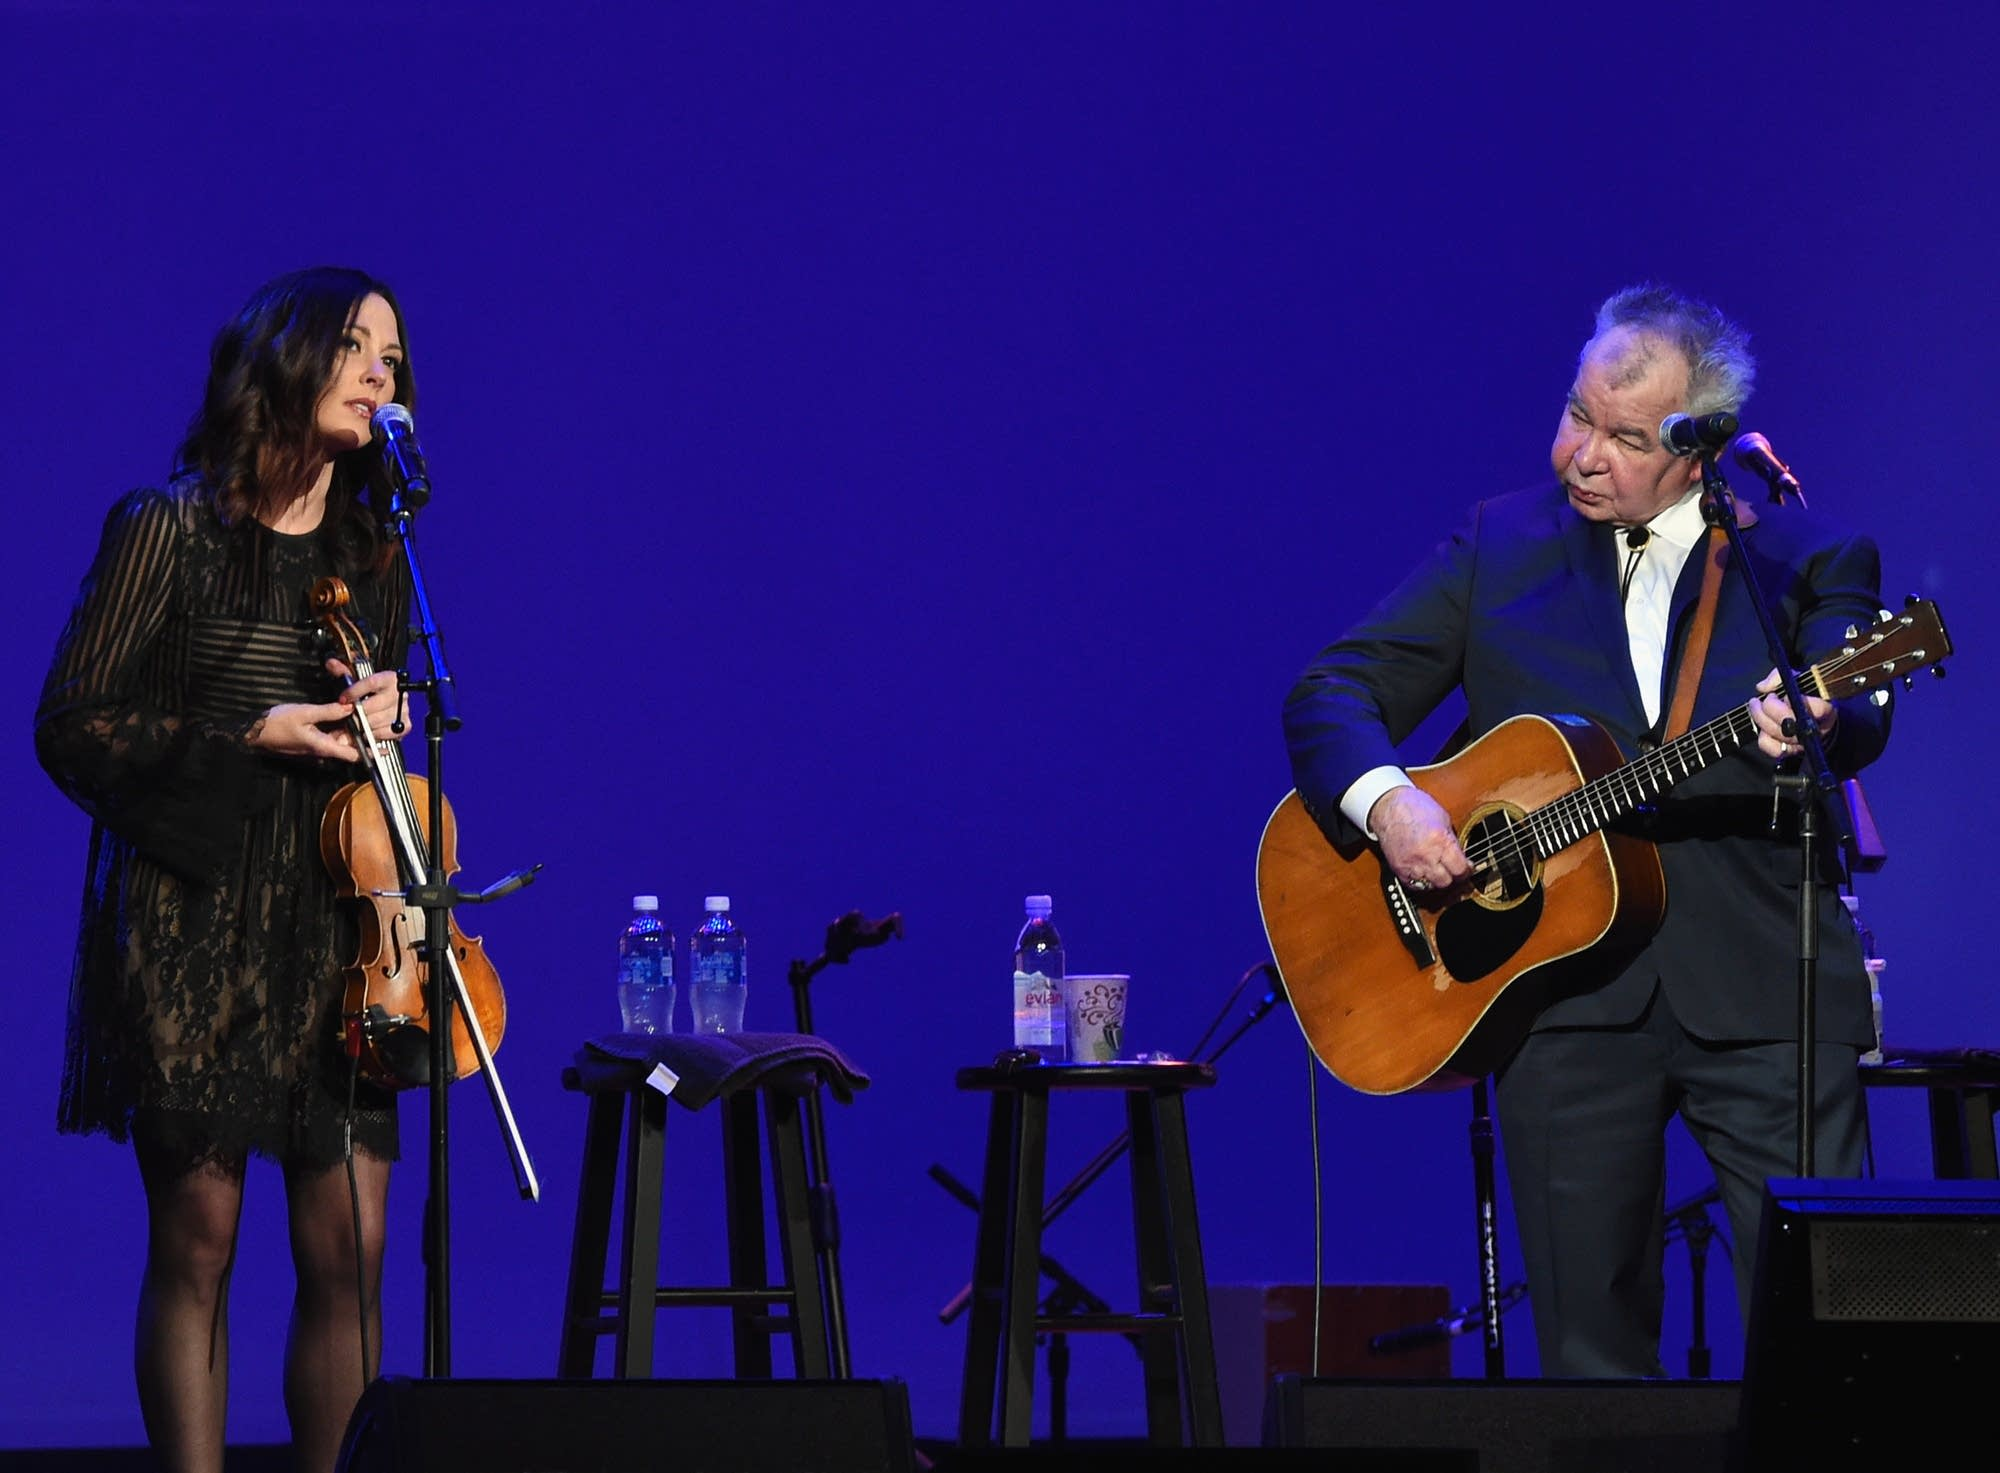 Amanda Shires and John Prine performing onstage in 2017